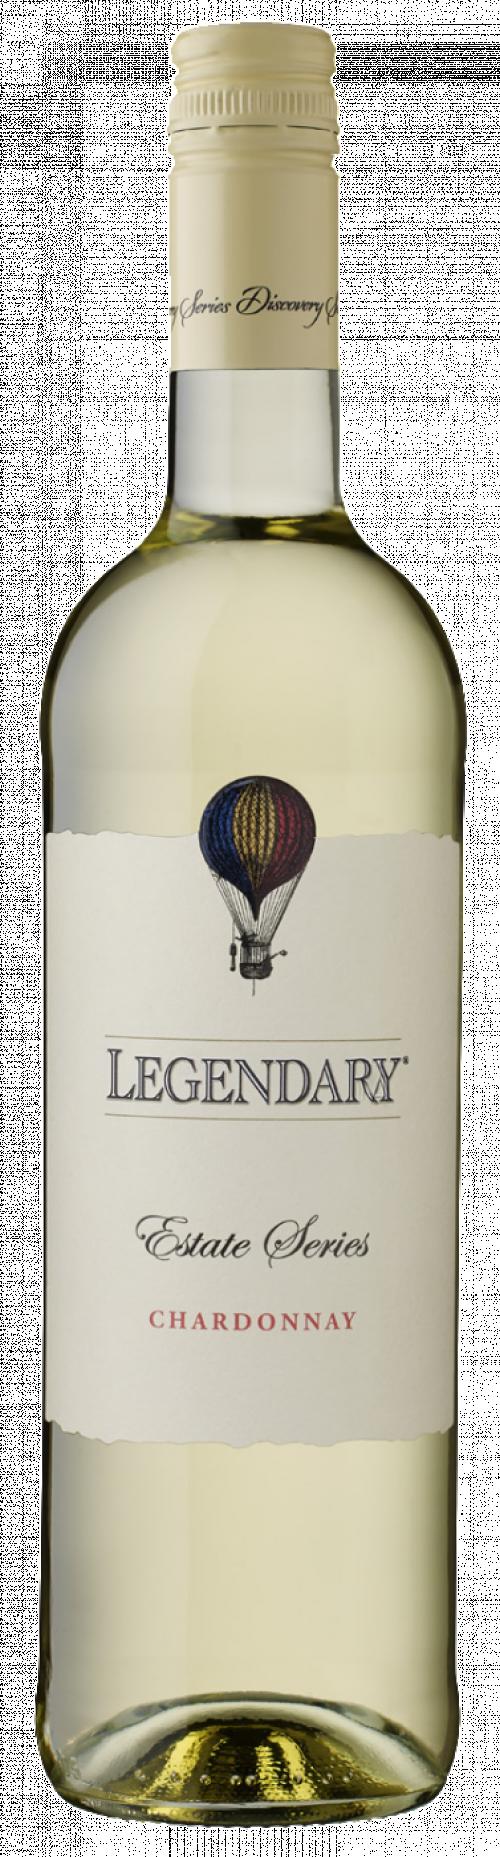 Legendary Chardonnay 1.5 Ltr